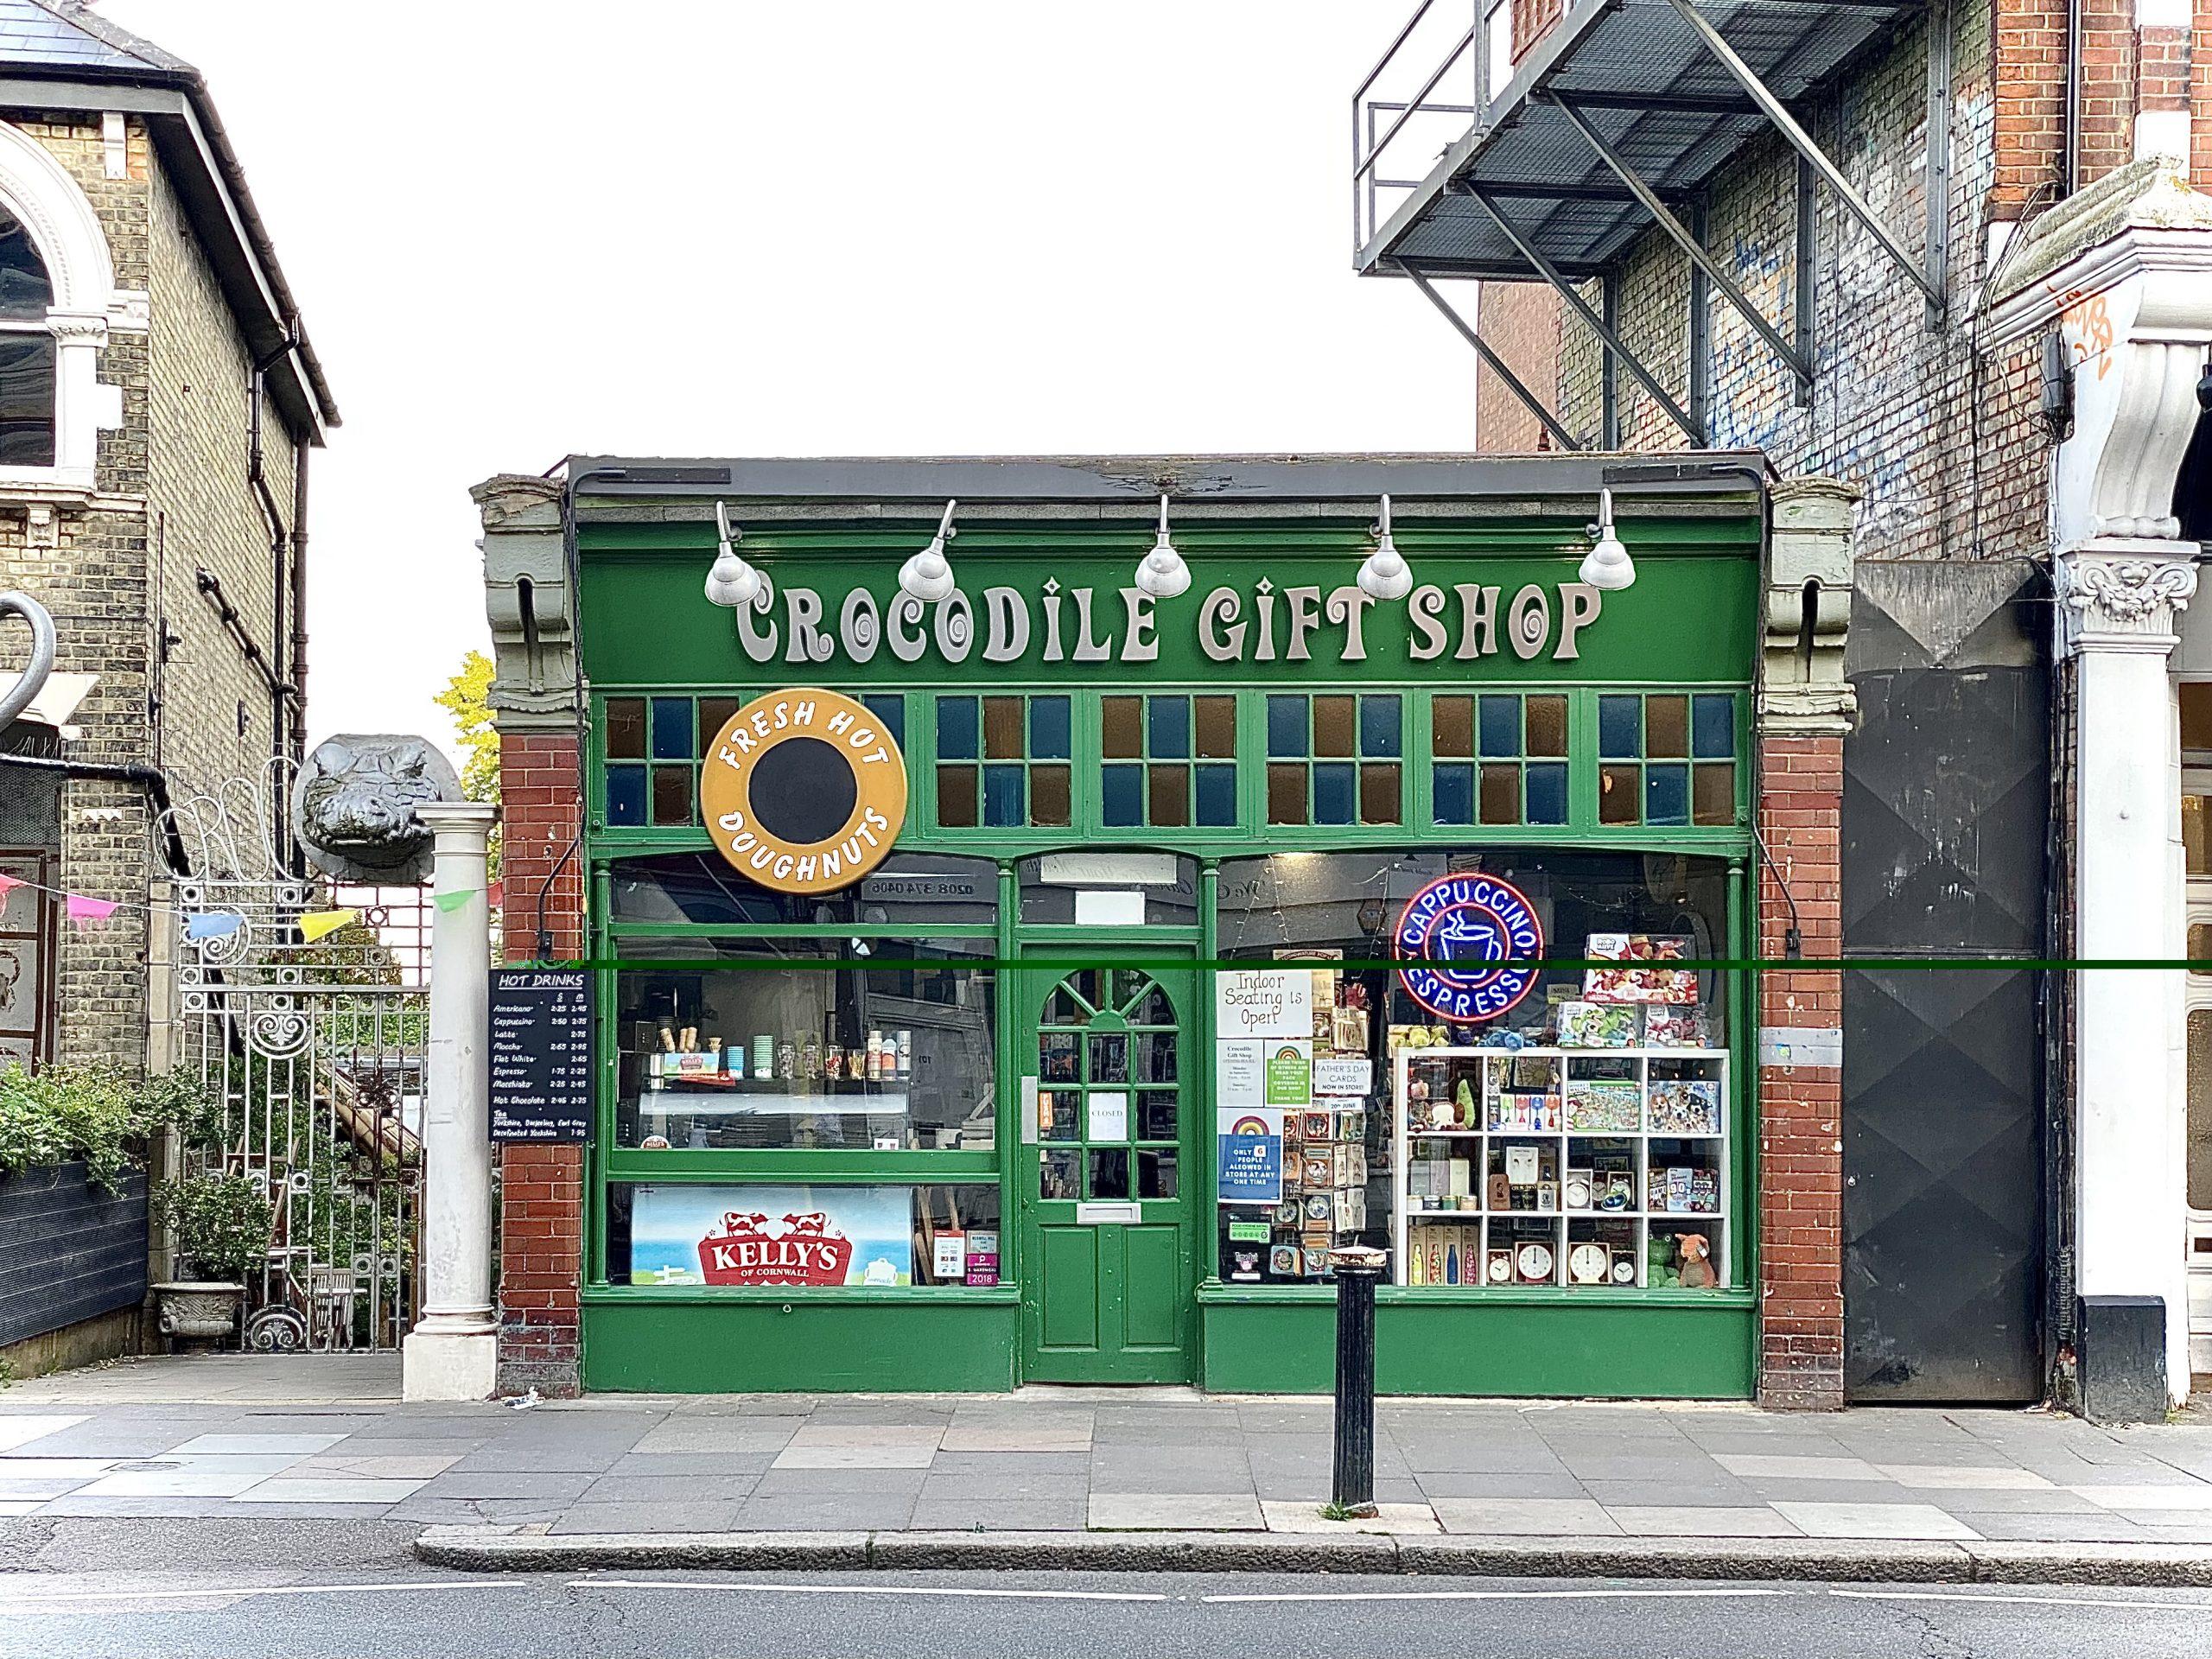 Crocodile Gift Shop 2021